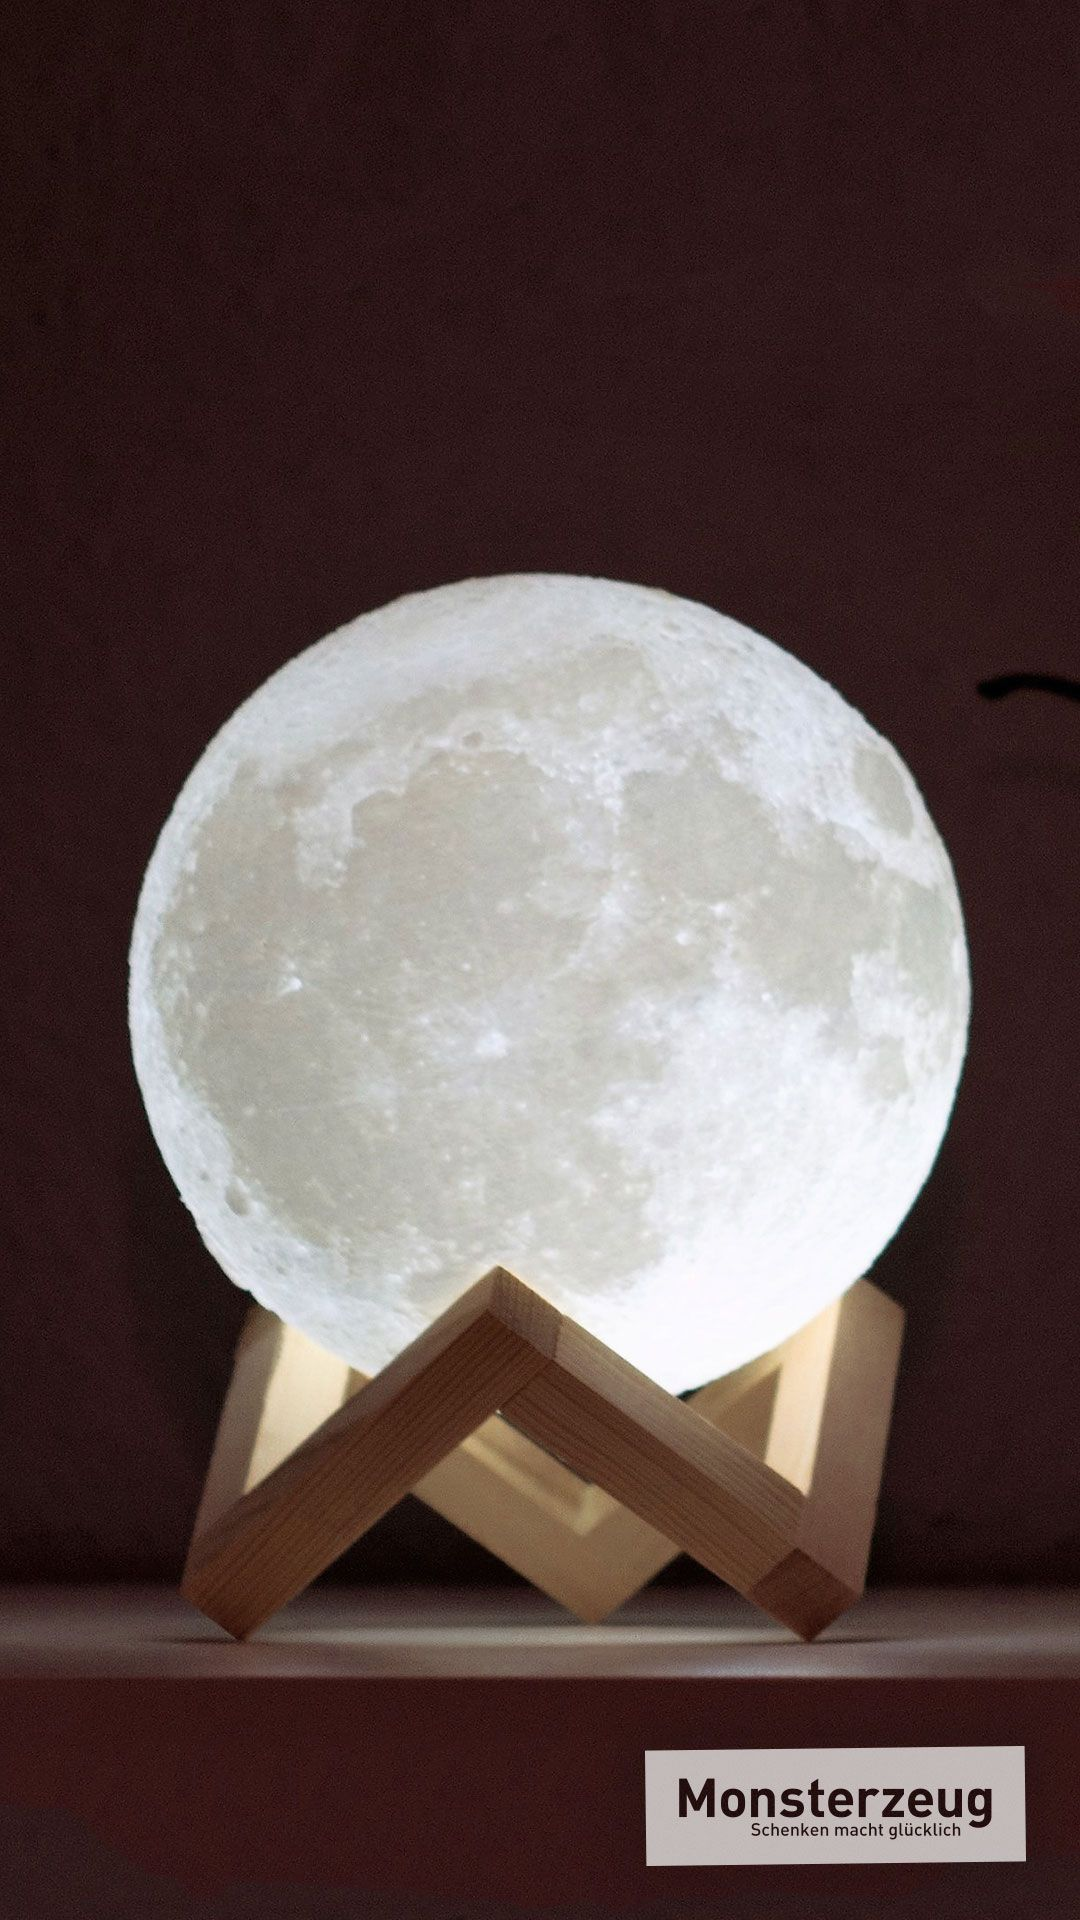 Galaktische Mond Lampe Mond Lampe Lampe Lampen Decke